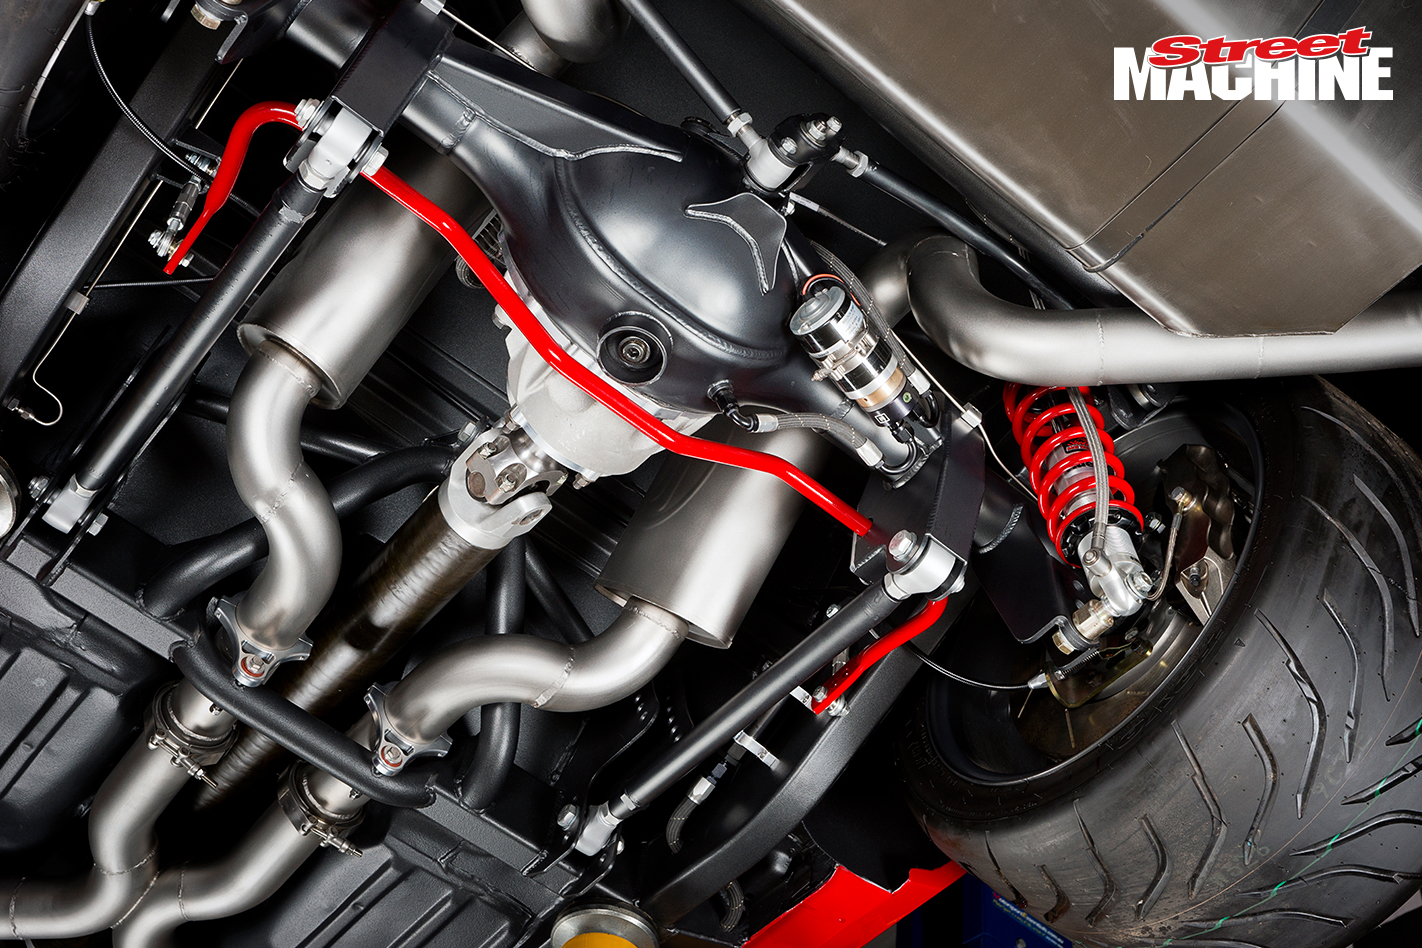 69 Camaro Pro Touring LSX 11 Nw